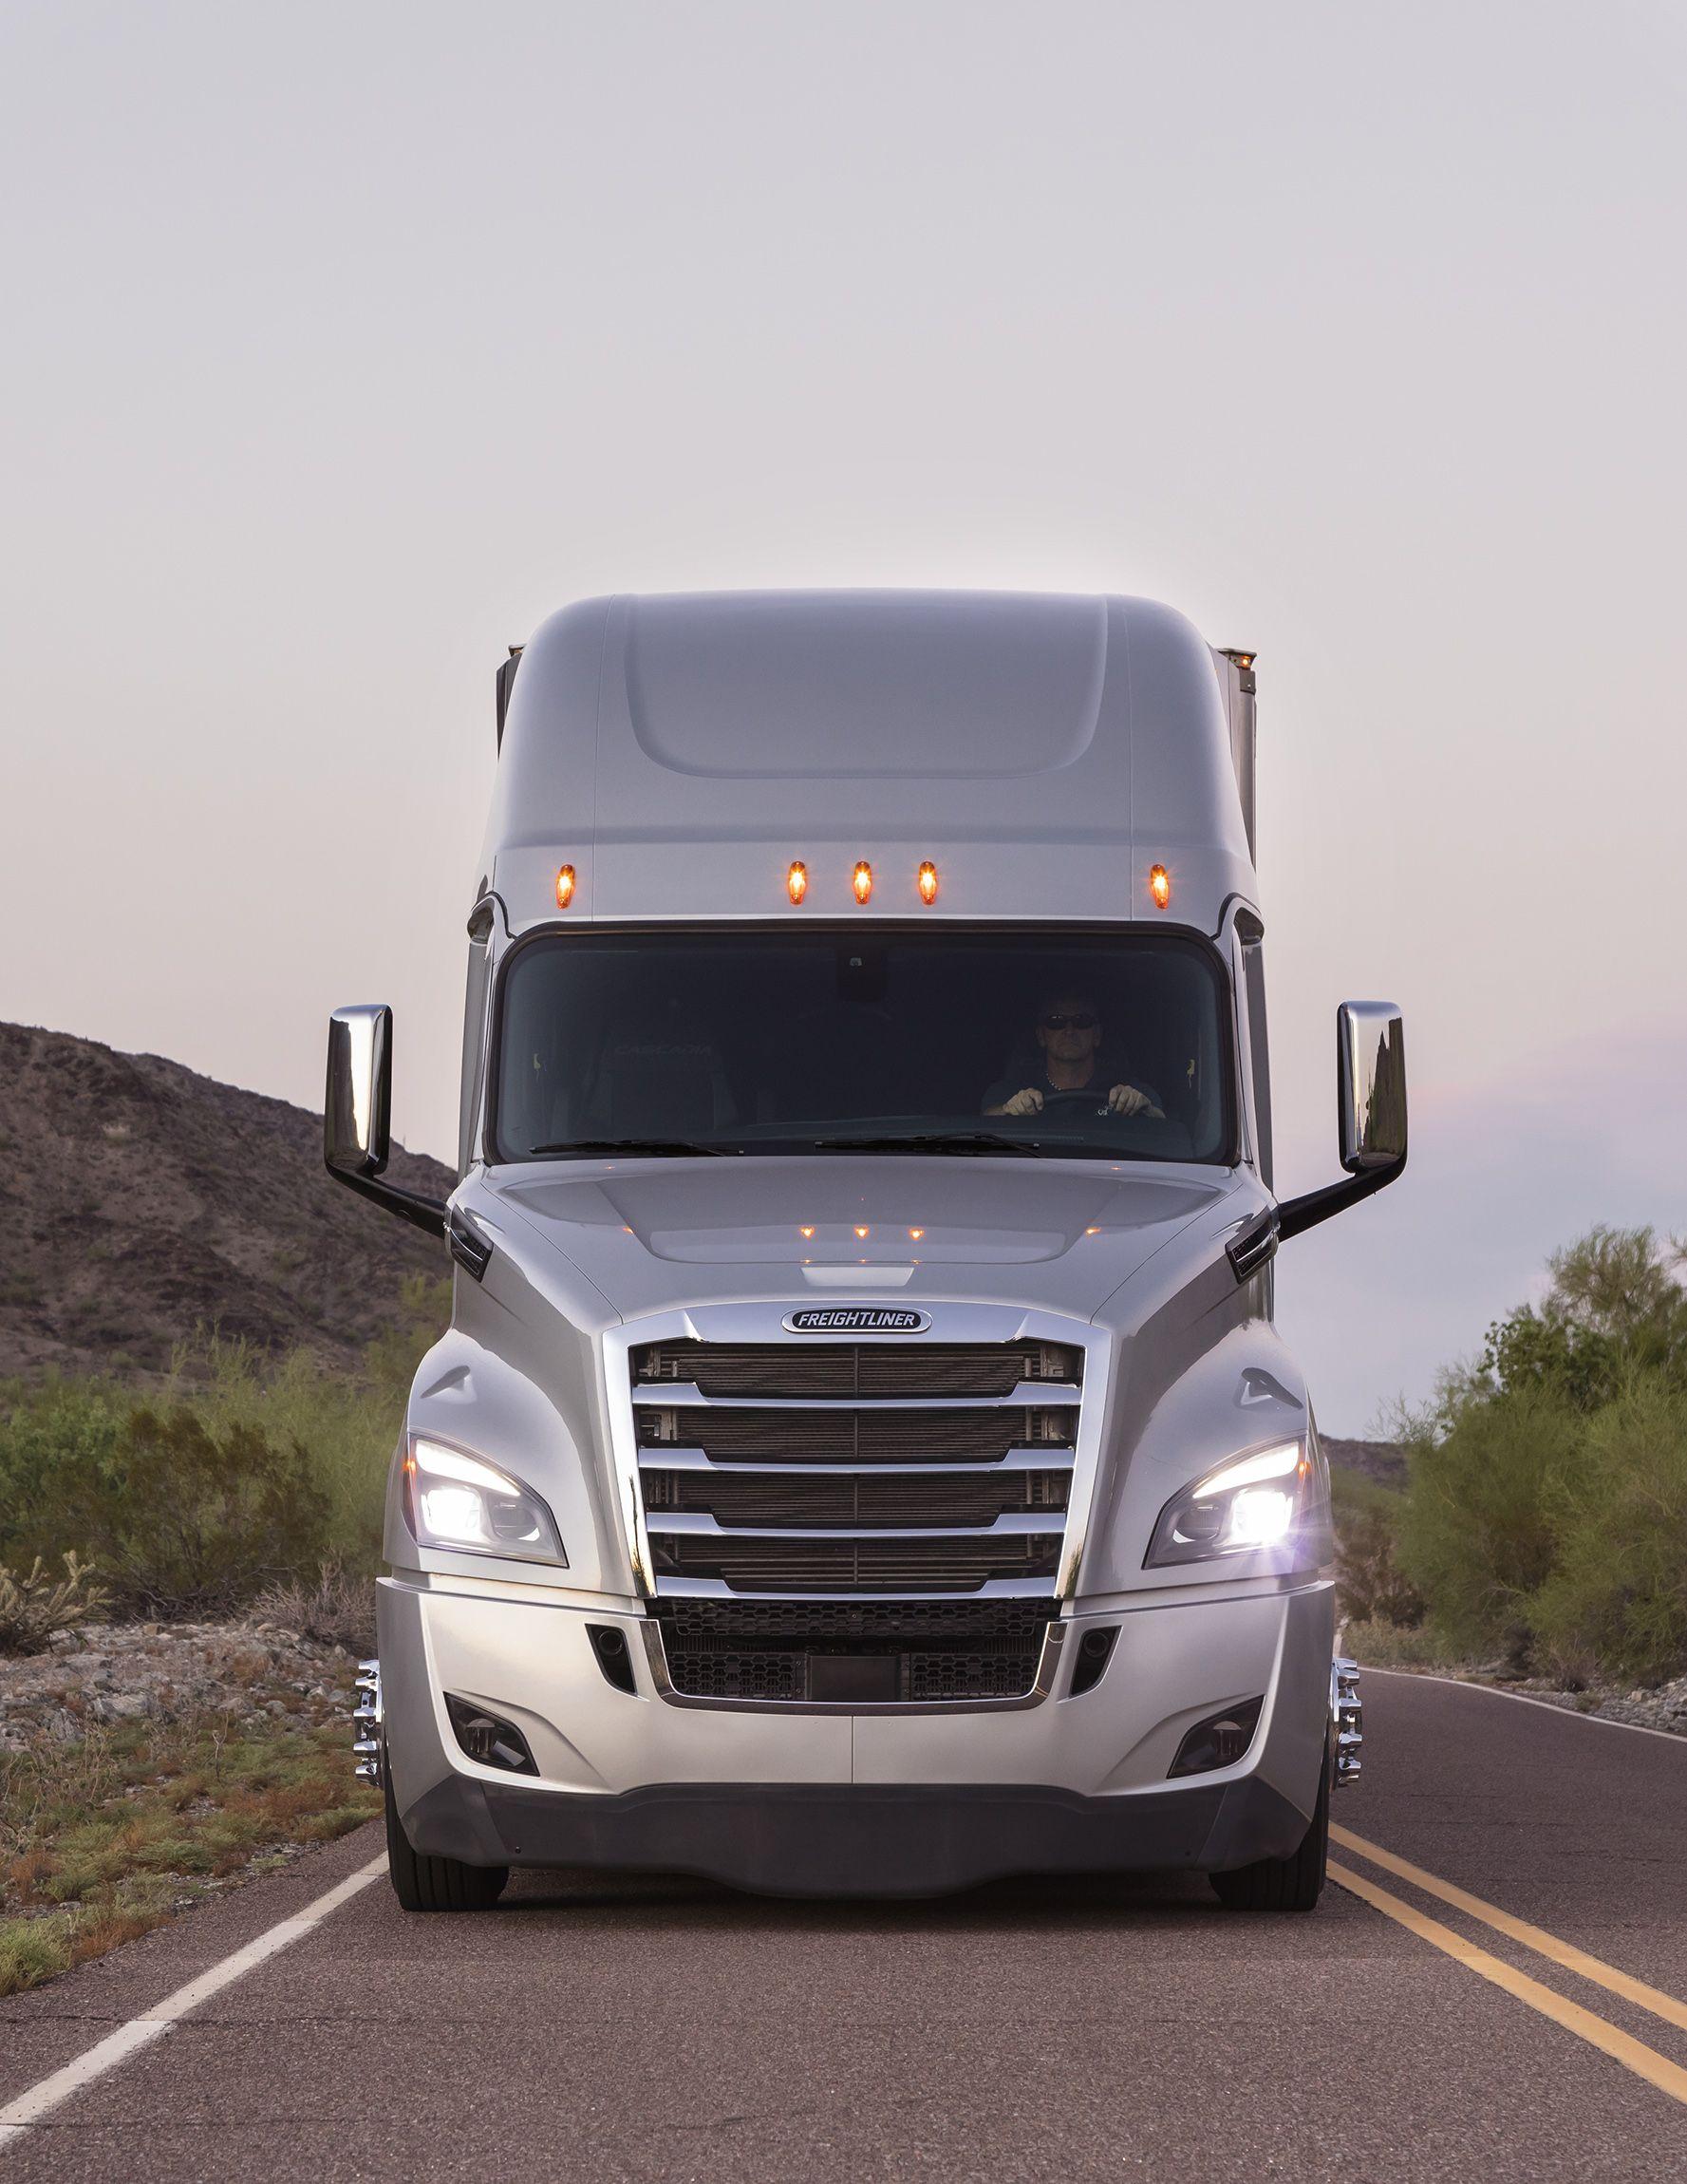 2017 Freightliner Cascadia Freightliner Trucks Big Trucks Freightliner